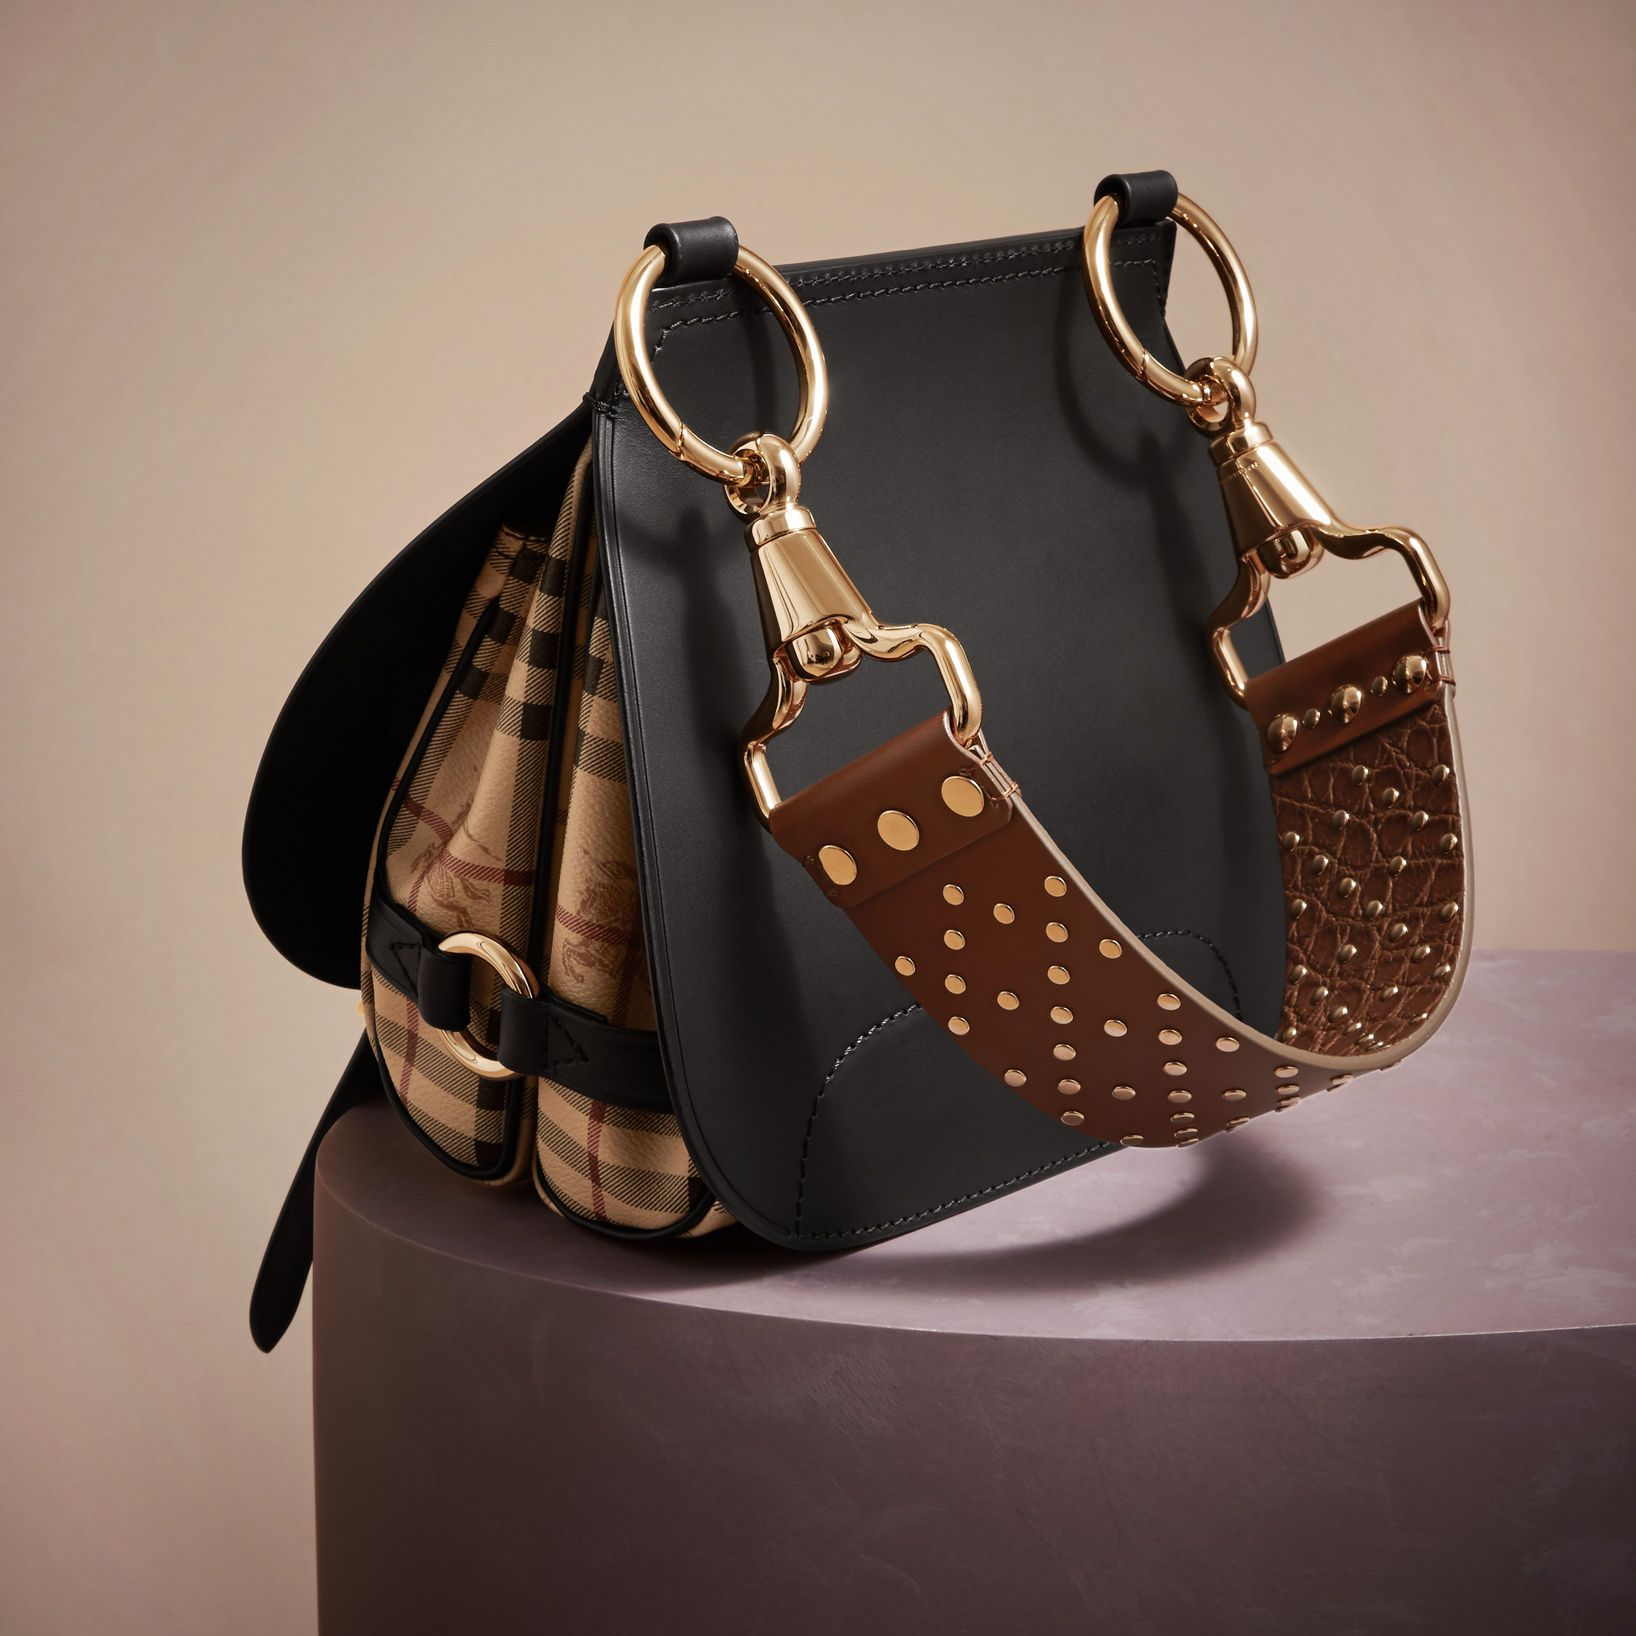 Moda de lujo para mujeres |  Oficial de Burberry®  – Bolsa